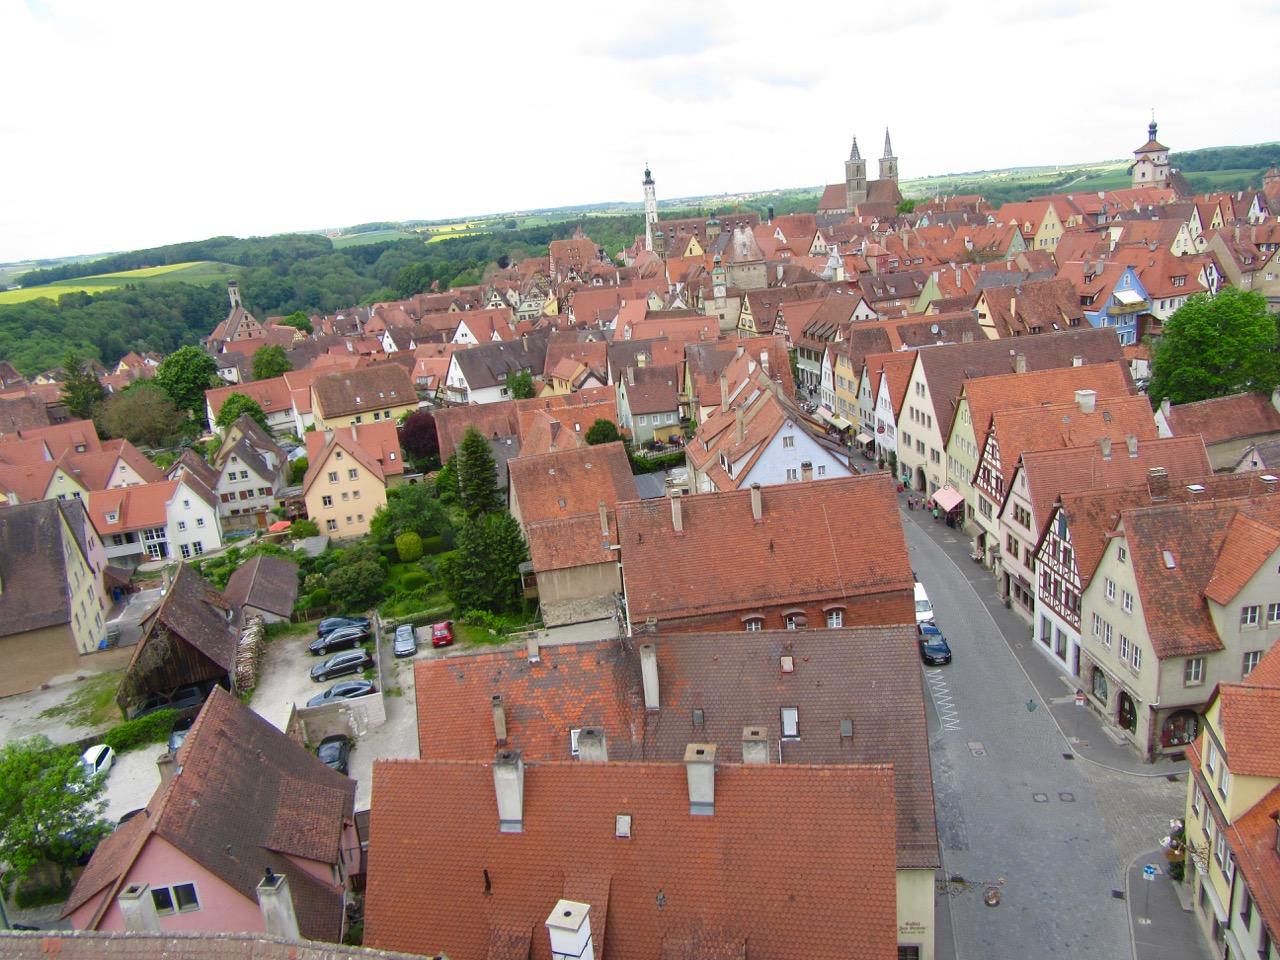 A bird's eye view of Rothenburg.